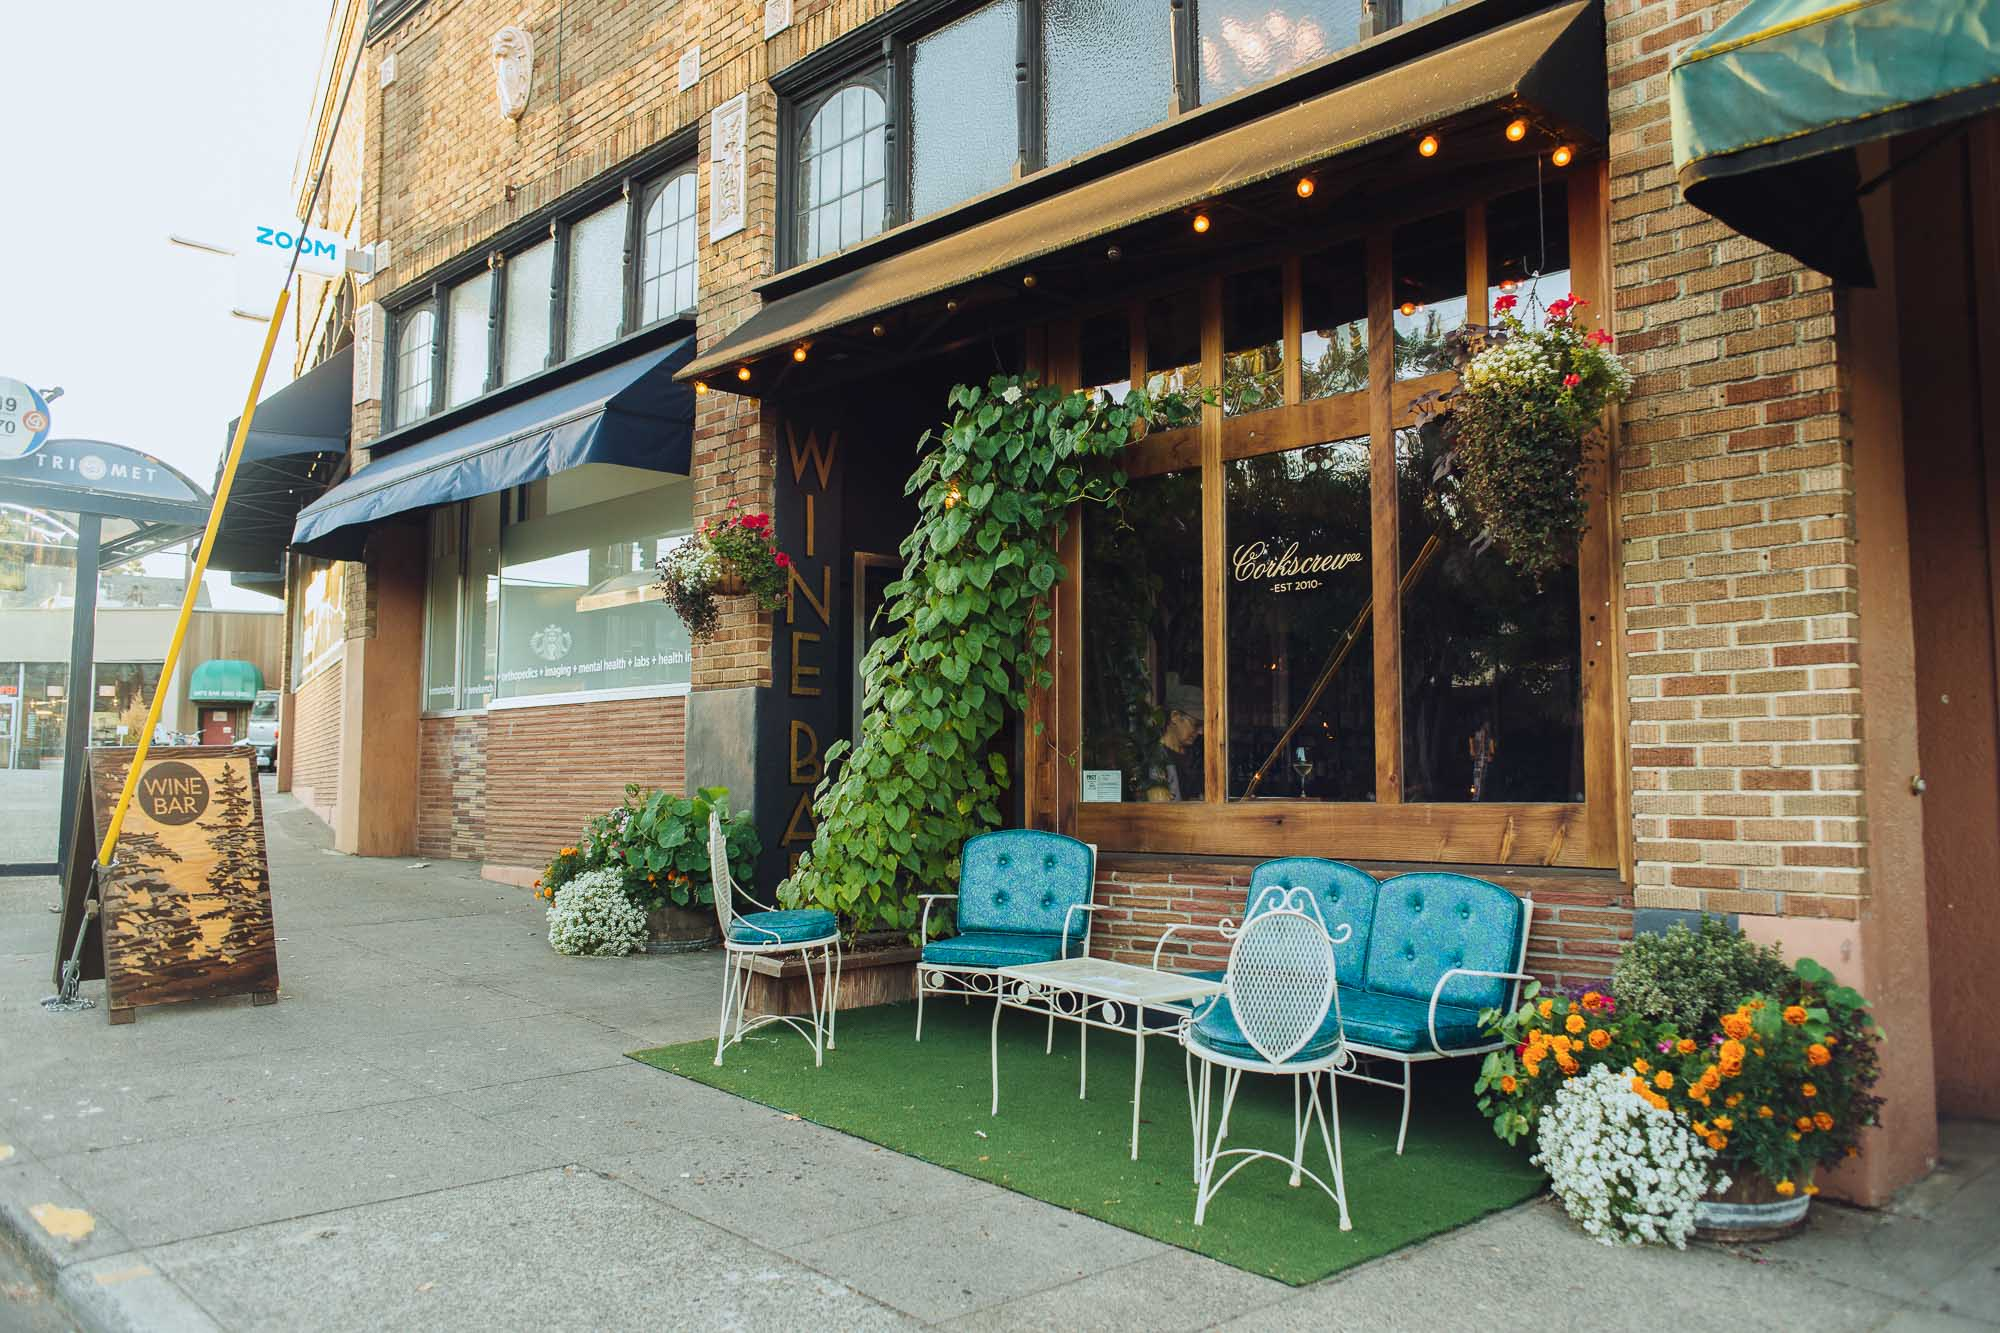 visit-sellwood-moreland-business-alliance_corkscrew-wine-bar-6.jpg